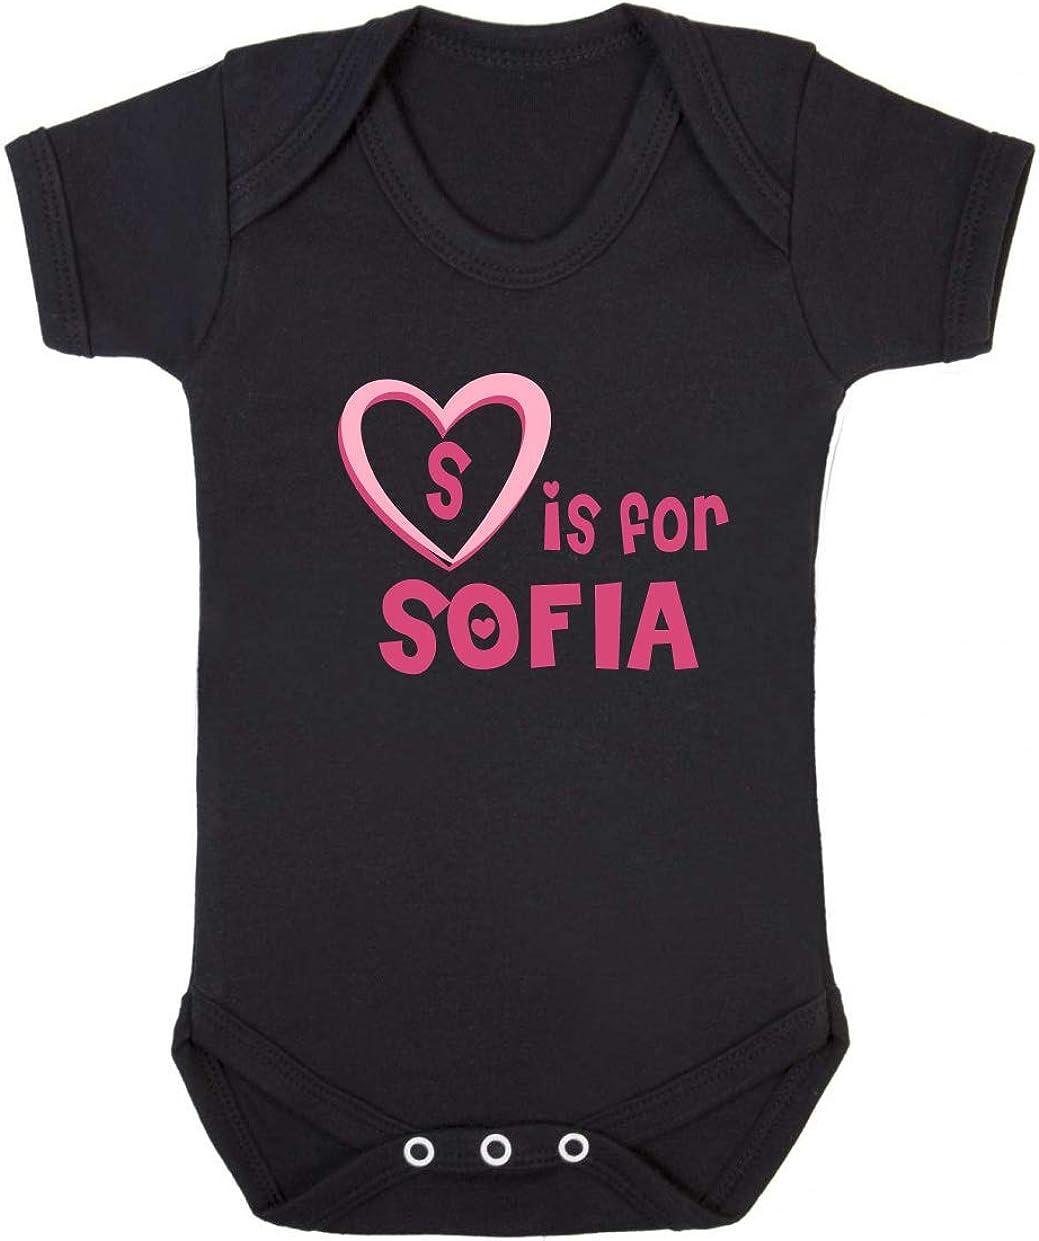 S is for Sofia Baby Vest Sofia Newborn Baby Vest Sofia Baby Gift